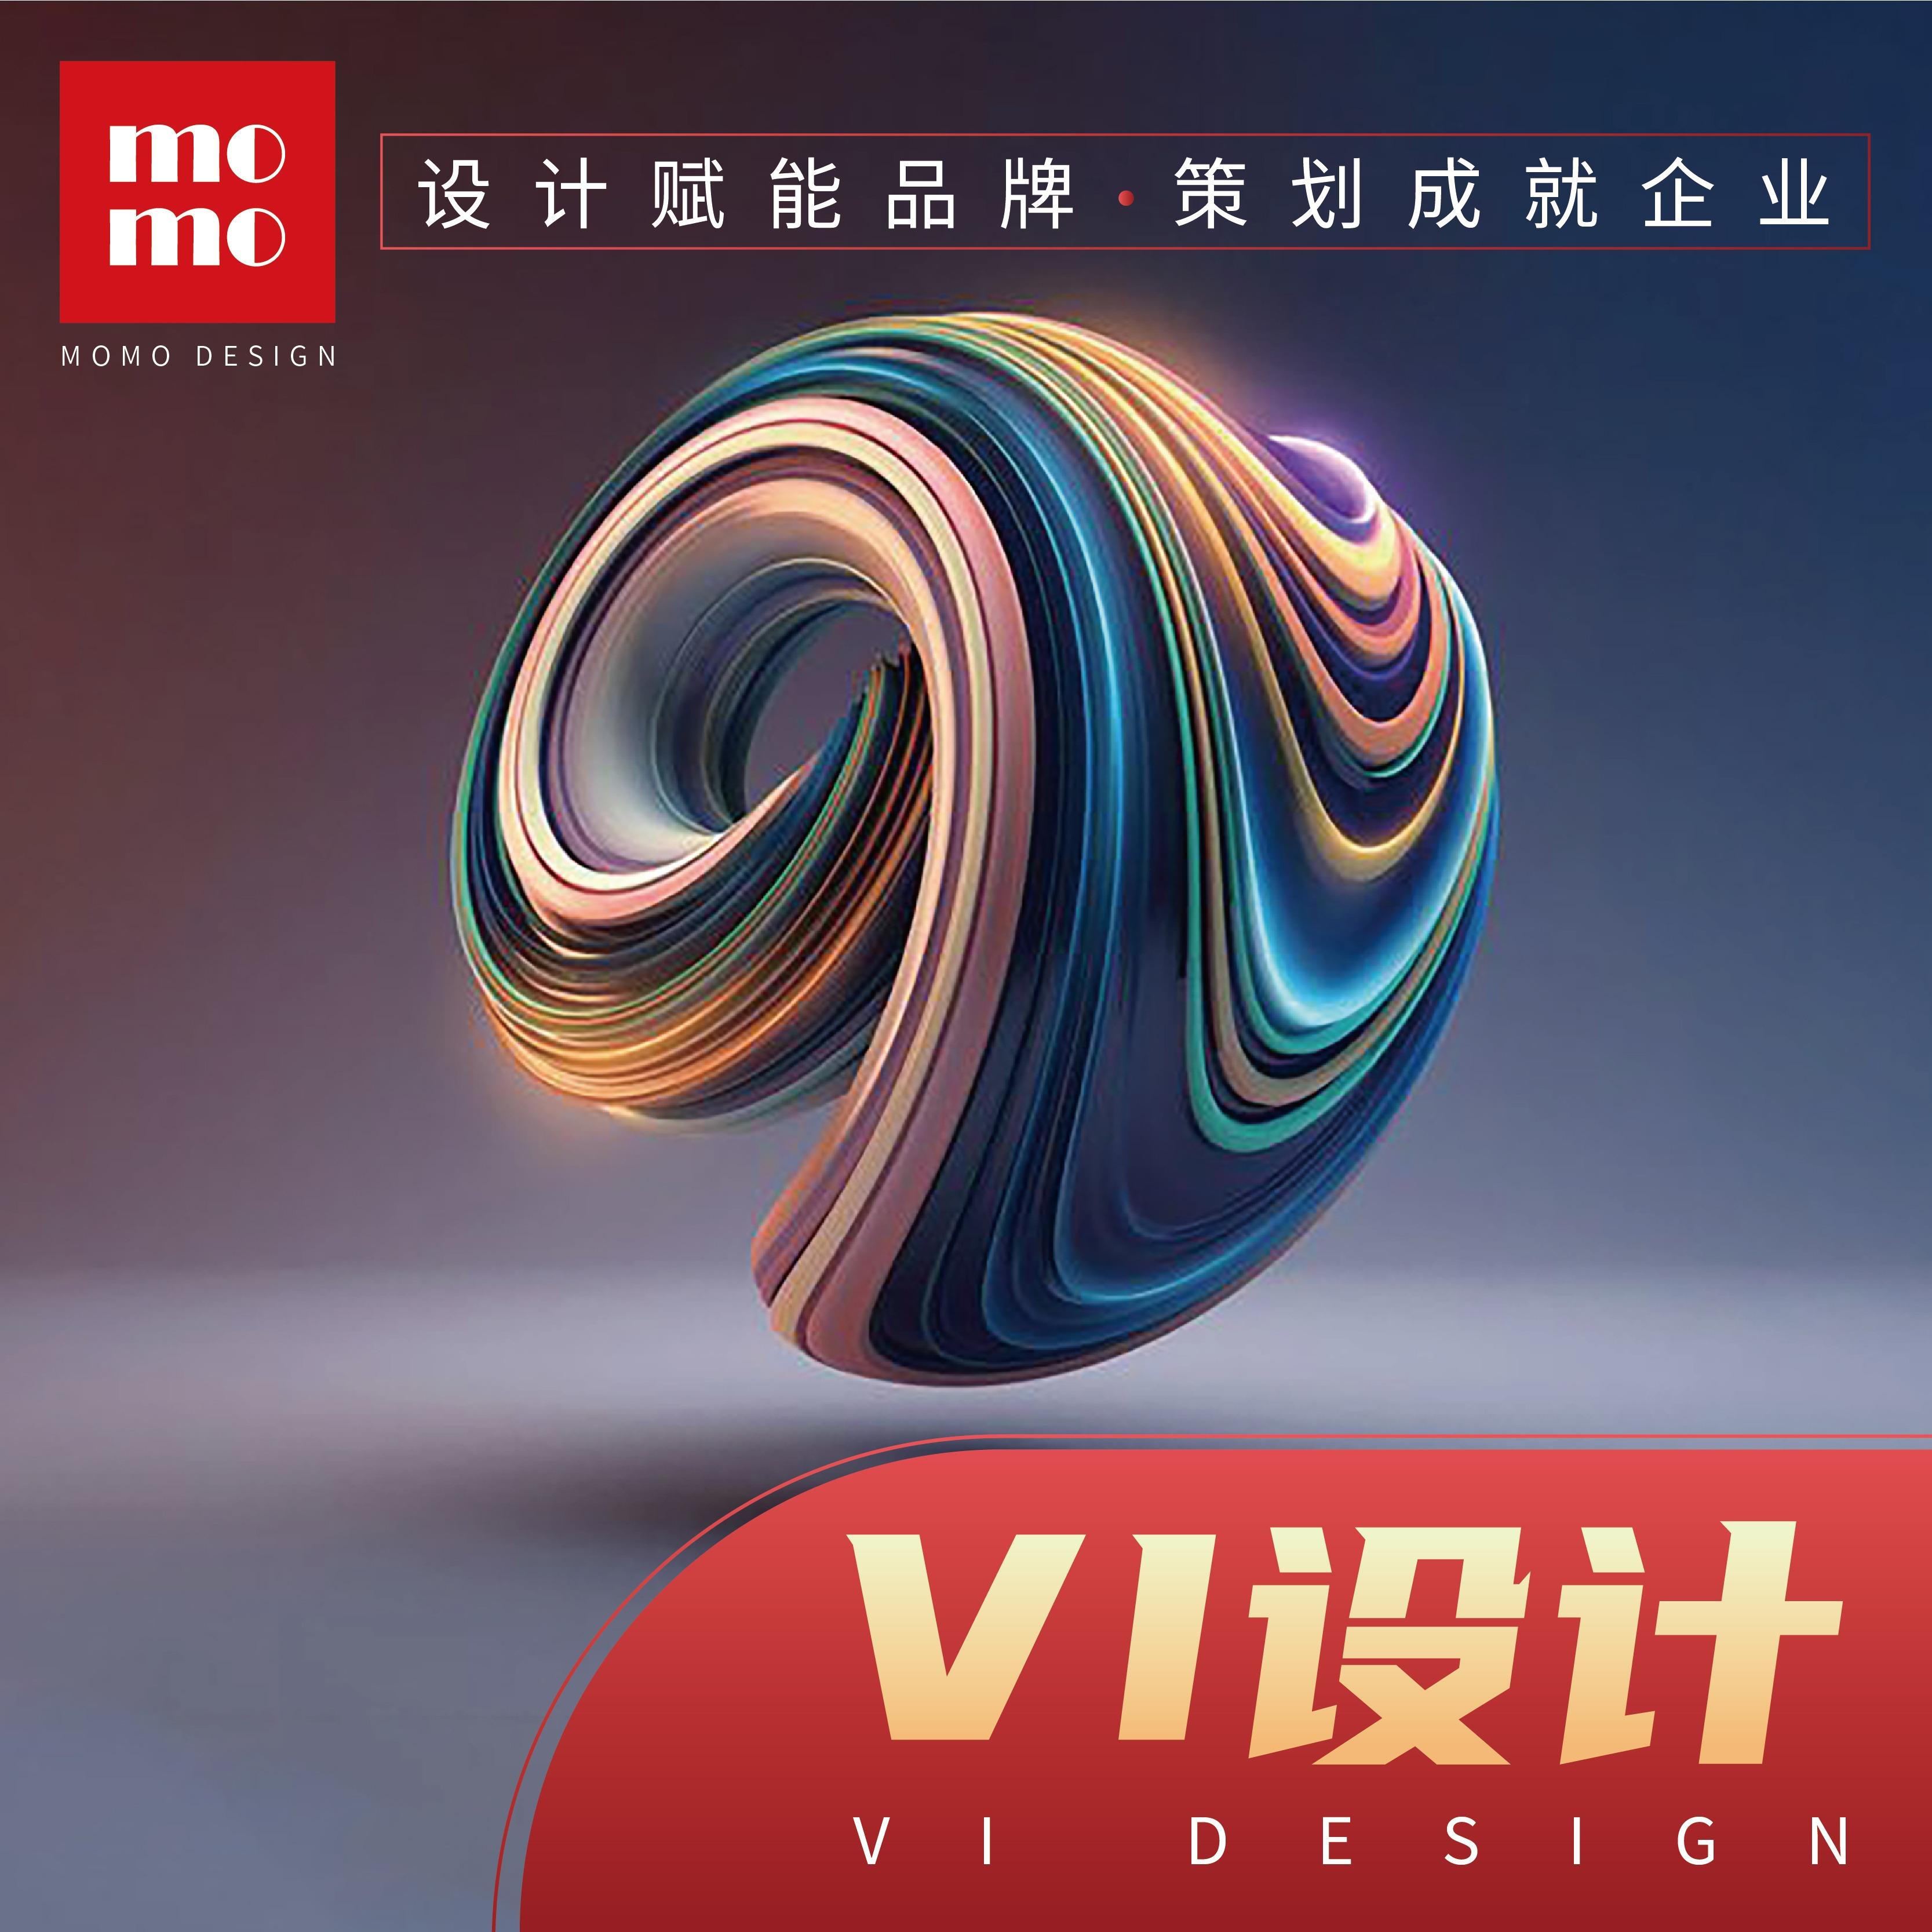 VI全套设计餐饮房地产家居建材服饰教育旅游VIS视觉导视系统